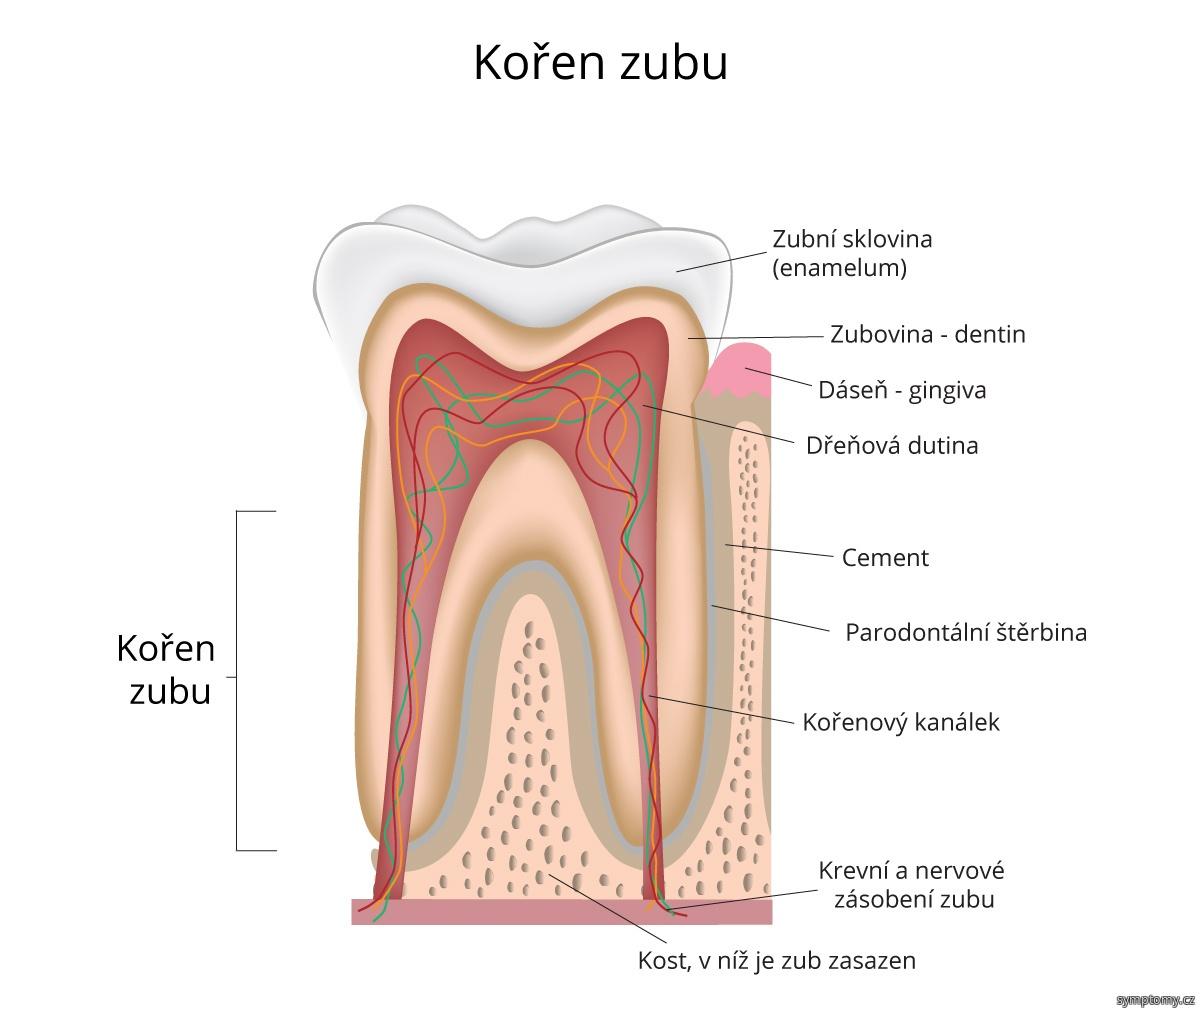 Kořen zubu